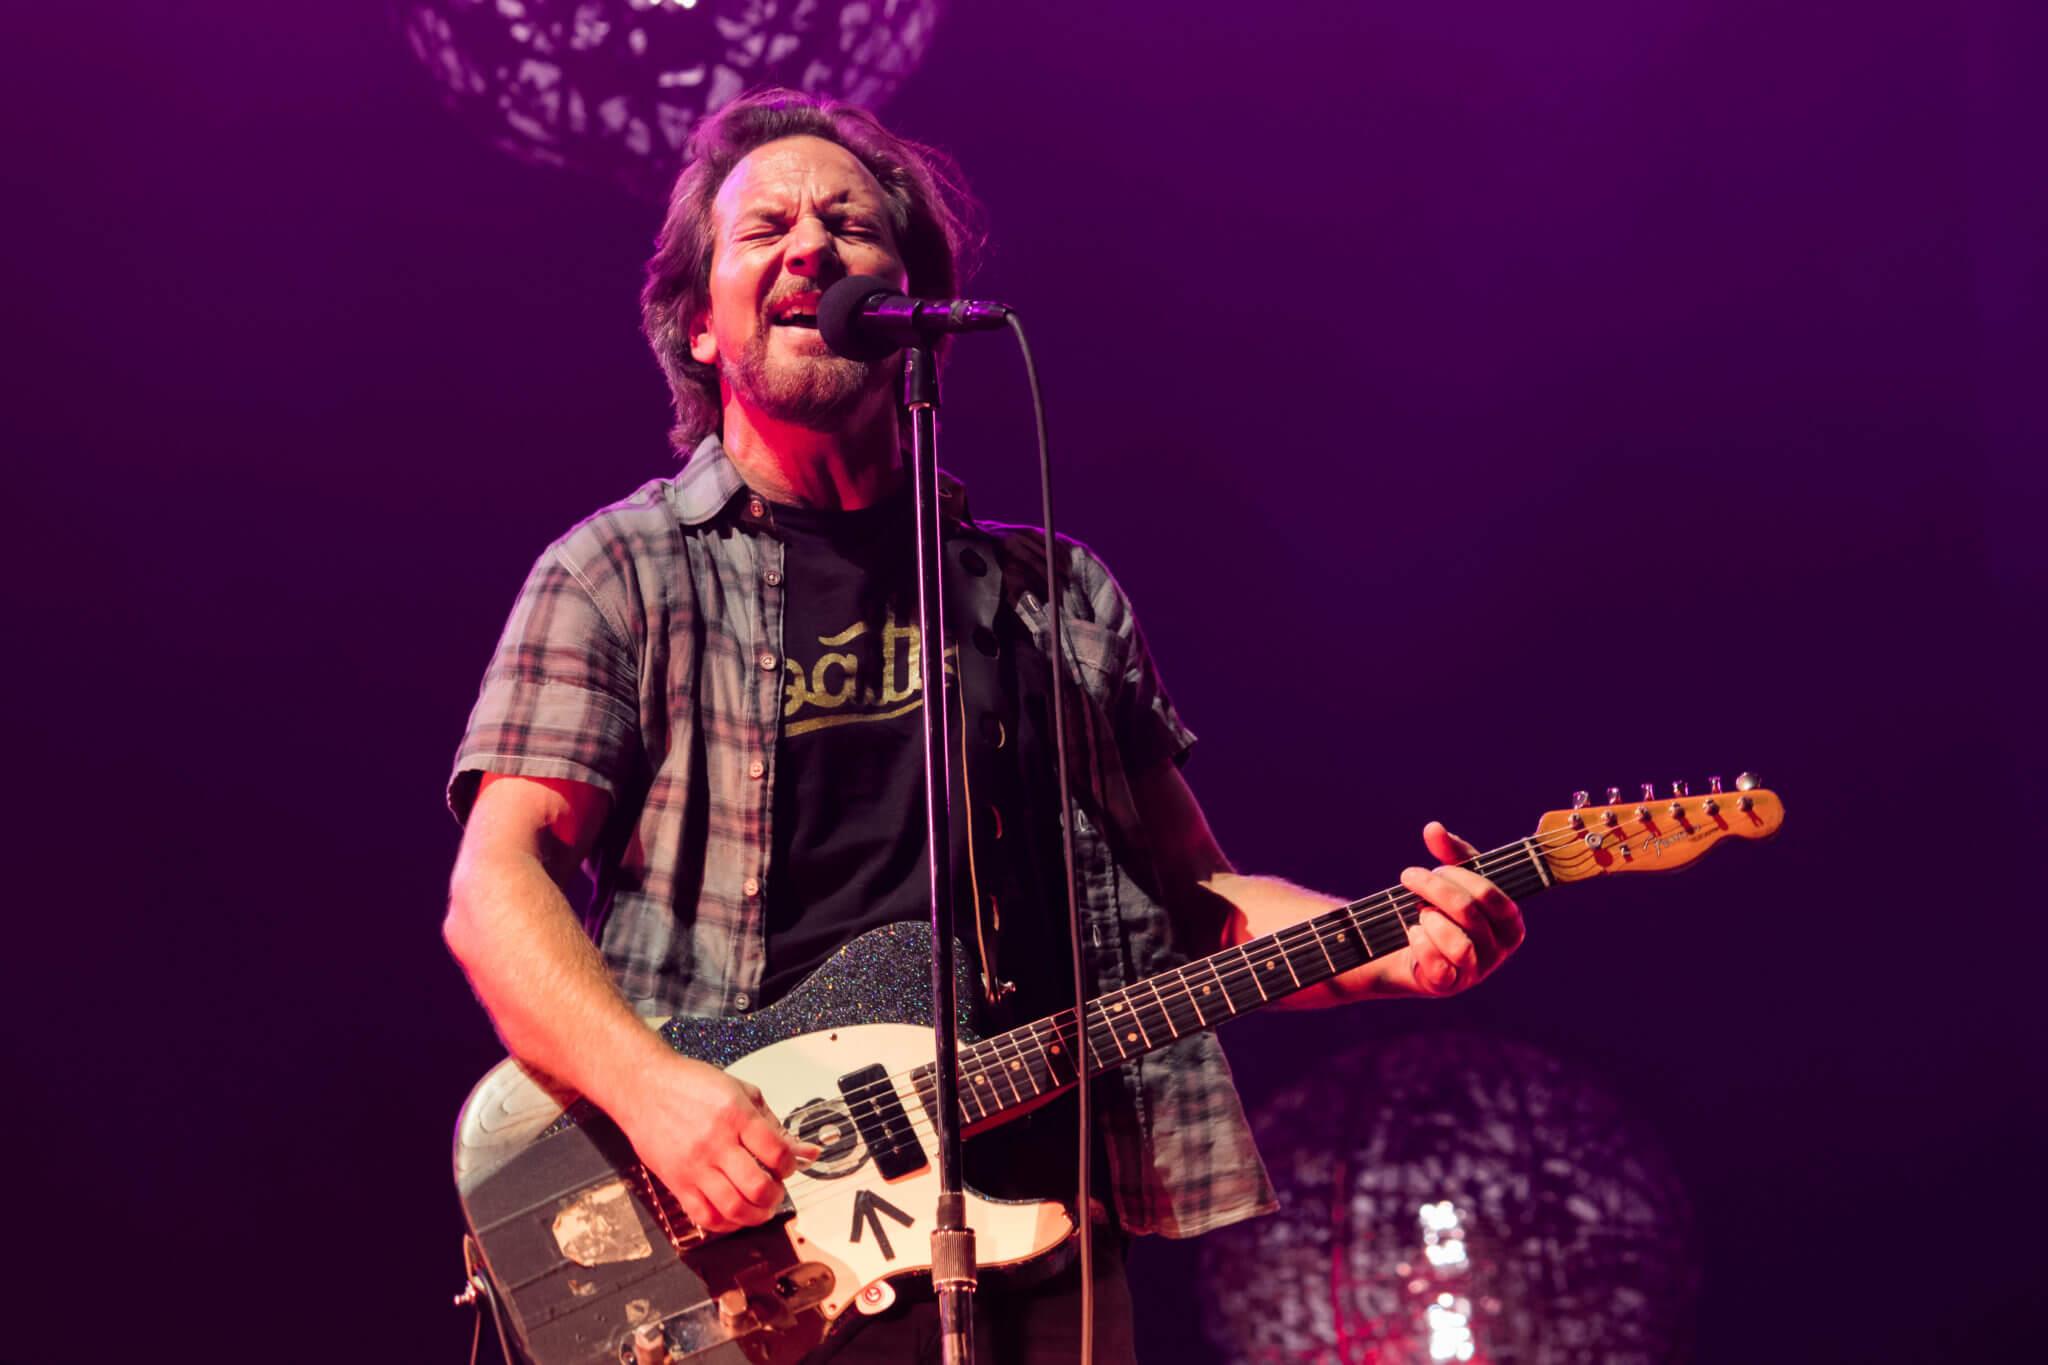 Pearl Jam @ Lollapalooza Chile 2018. Fotografía: Lukas Cruzat para mor.bo